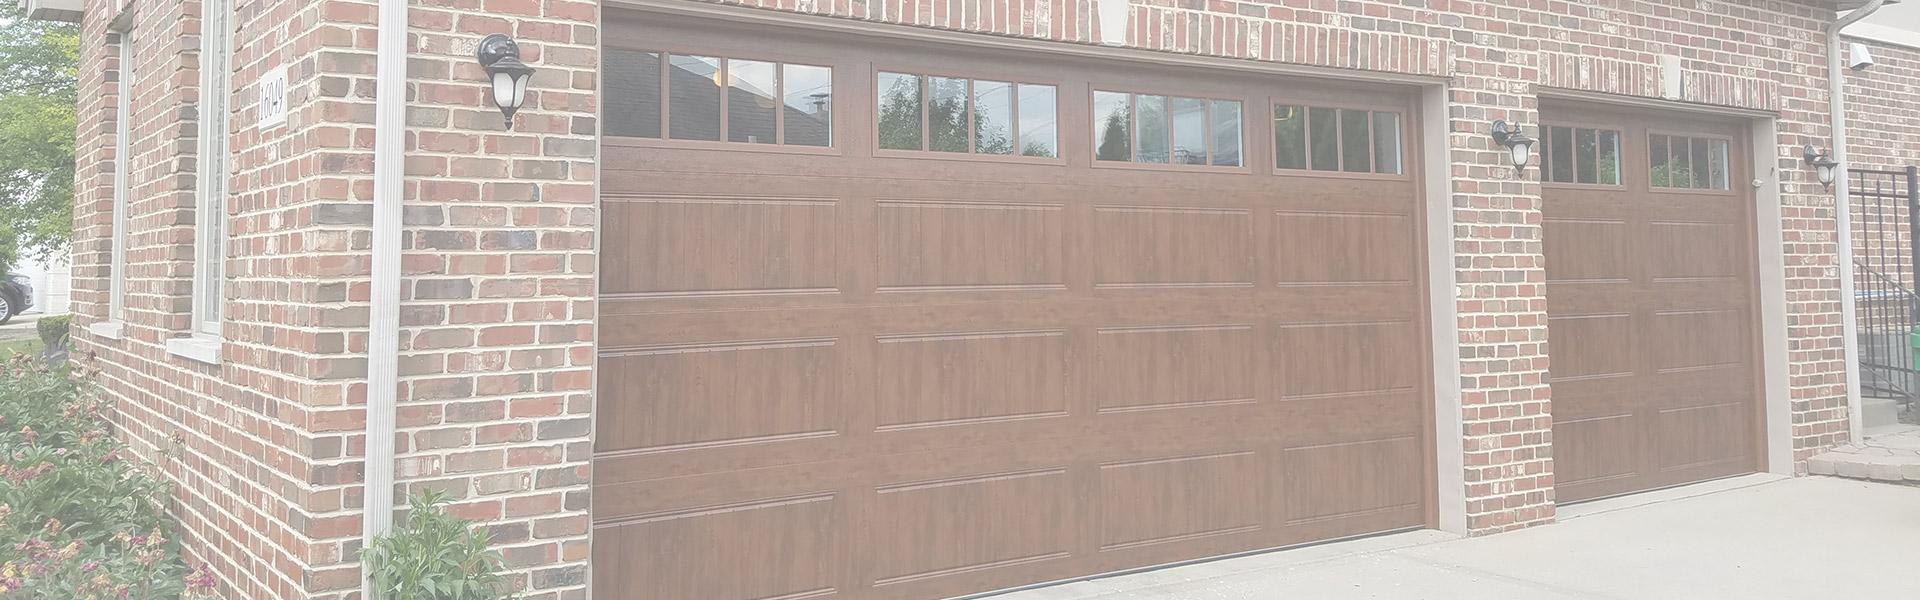 id lynnoverheaddoor in door openers overhead doors trucksville garage photos new added media pa lynn